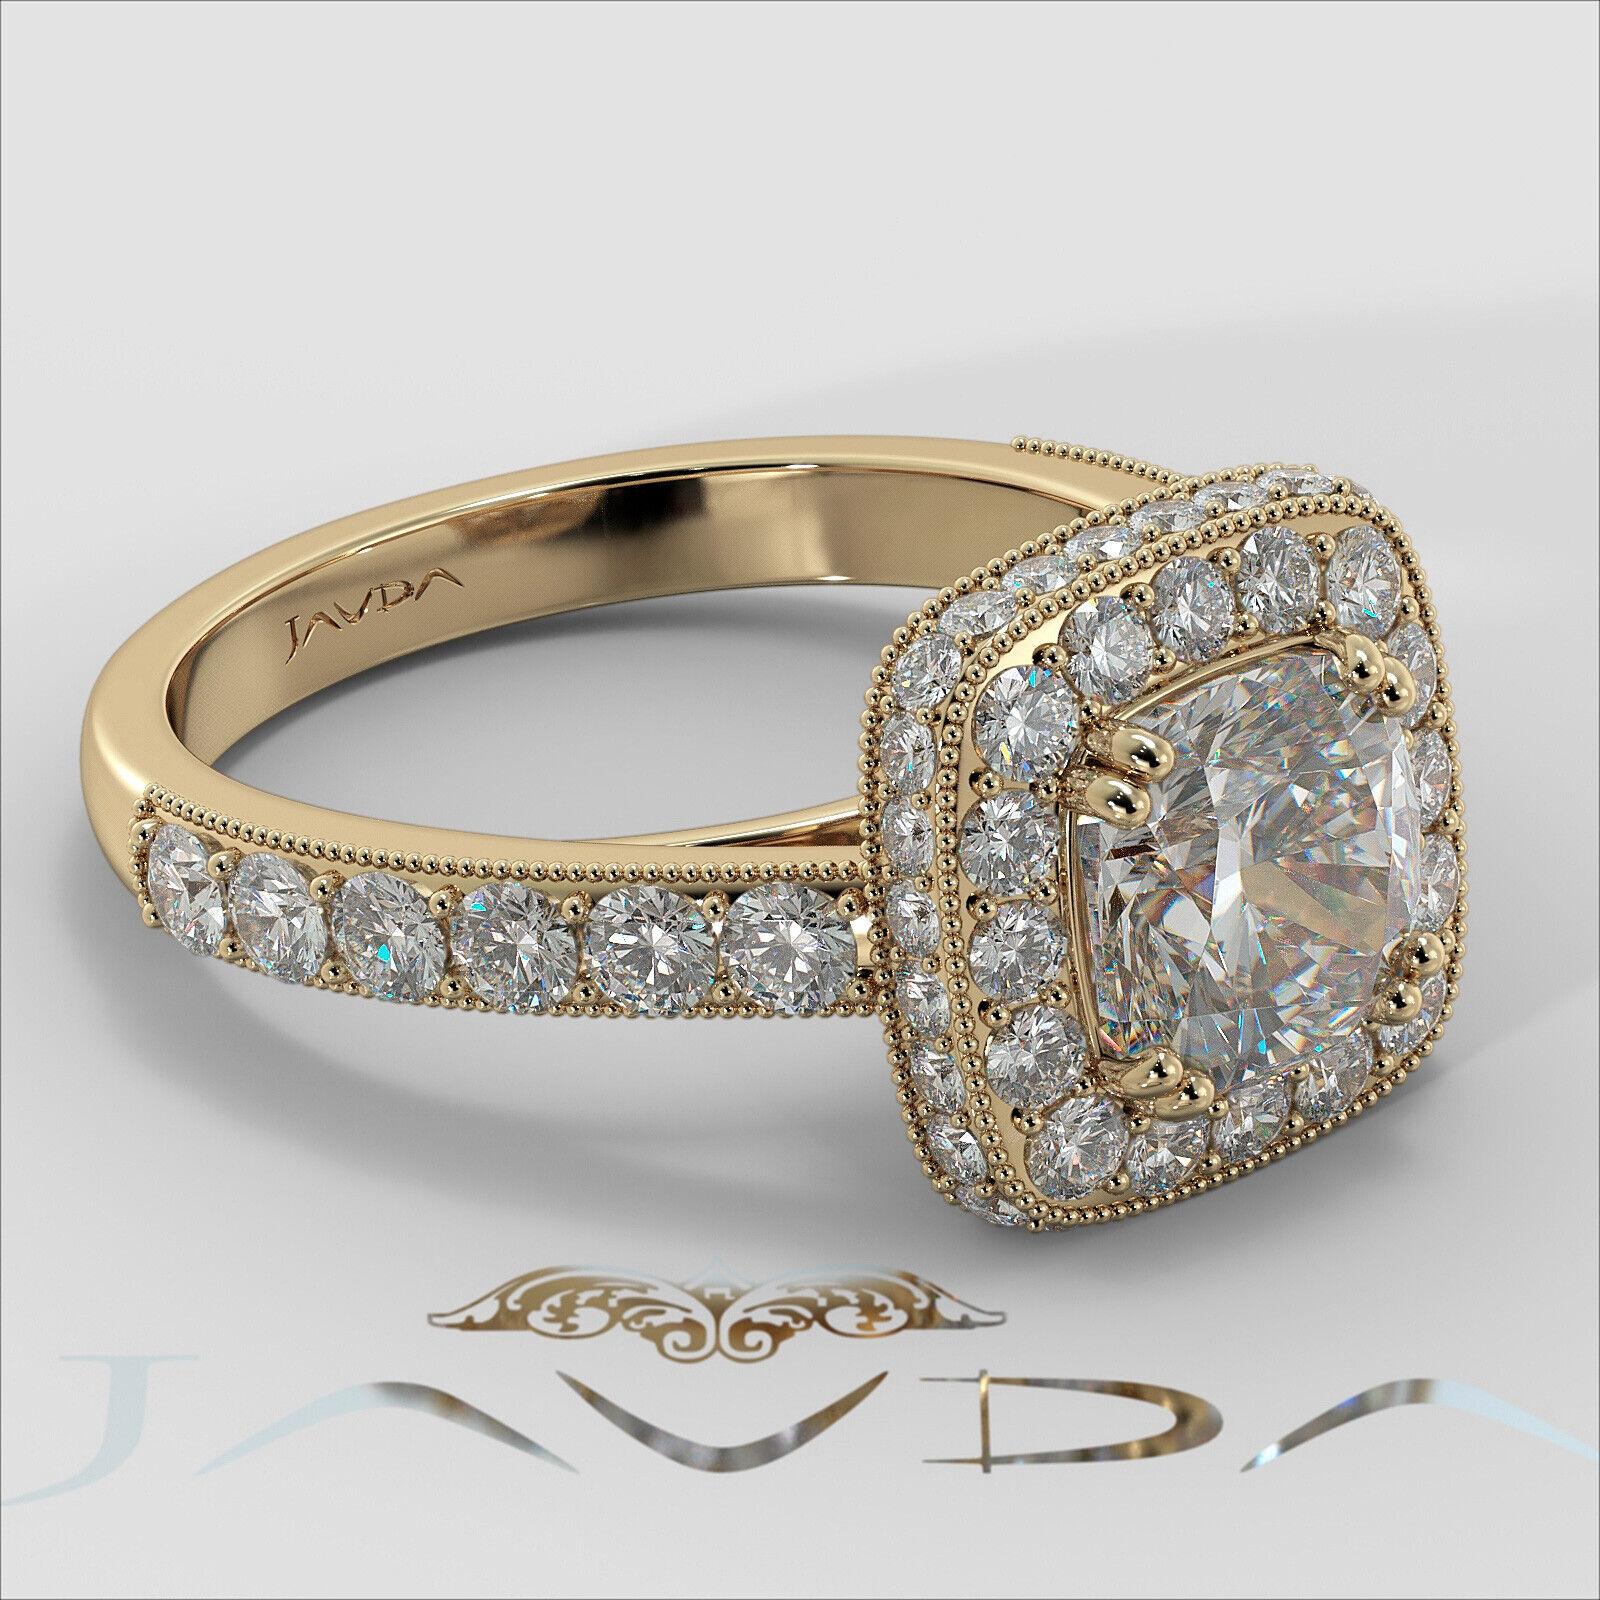 2ctw Milgrain Halo Floral Basket Cushion Diamond Engagement Ring GIA H-VS2 Gold 9